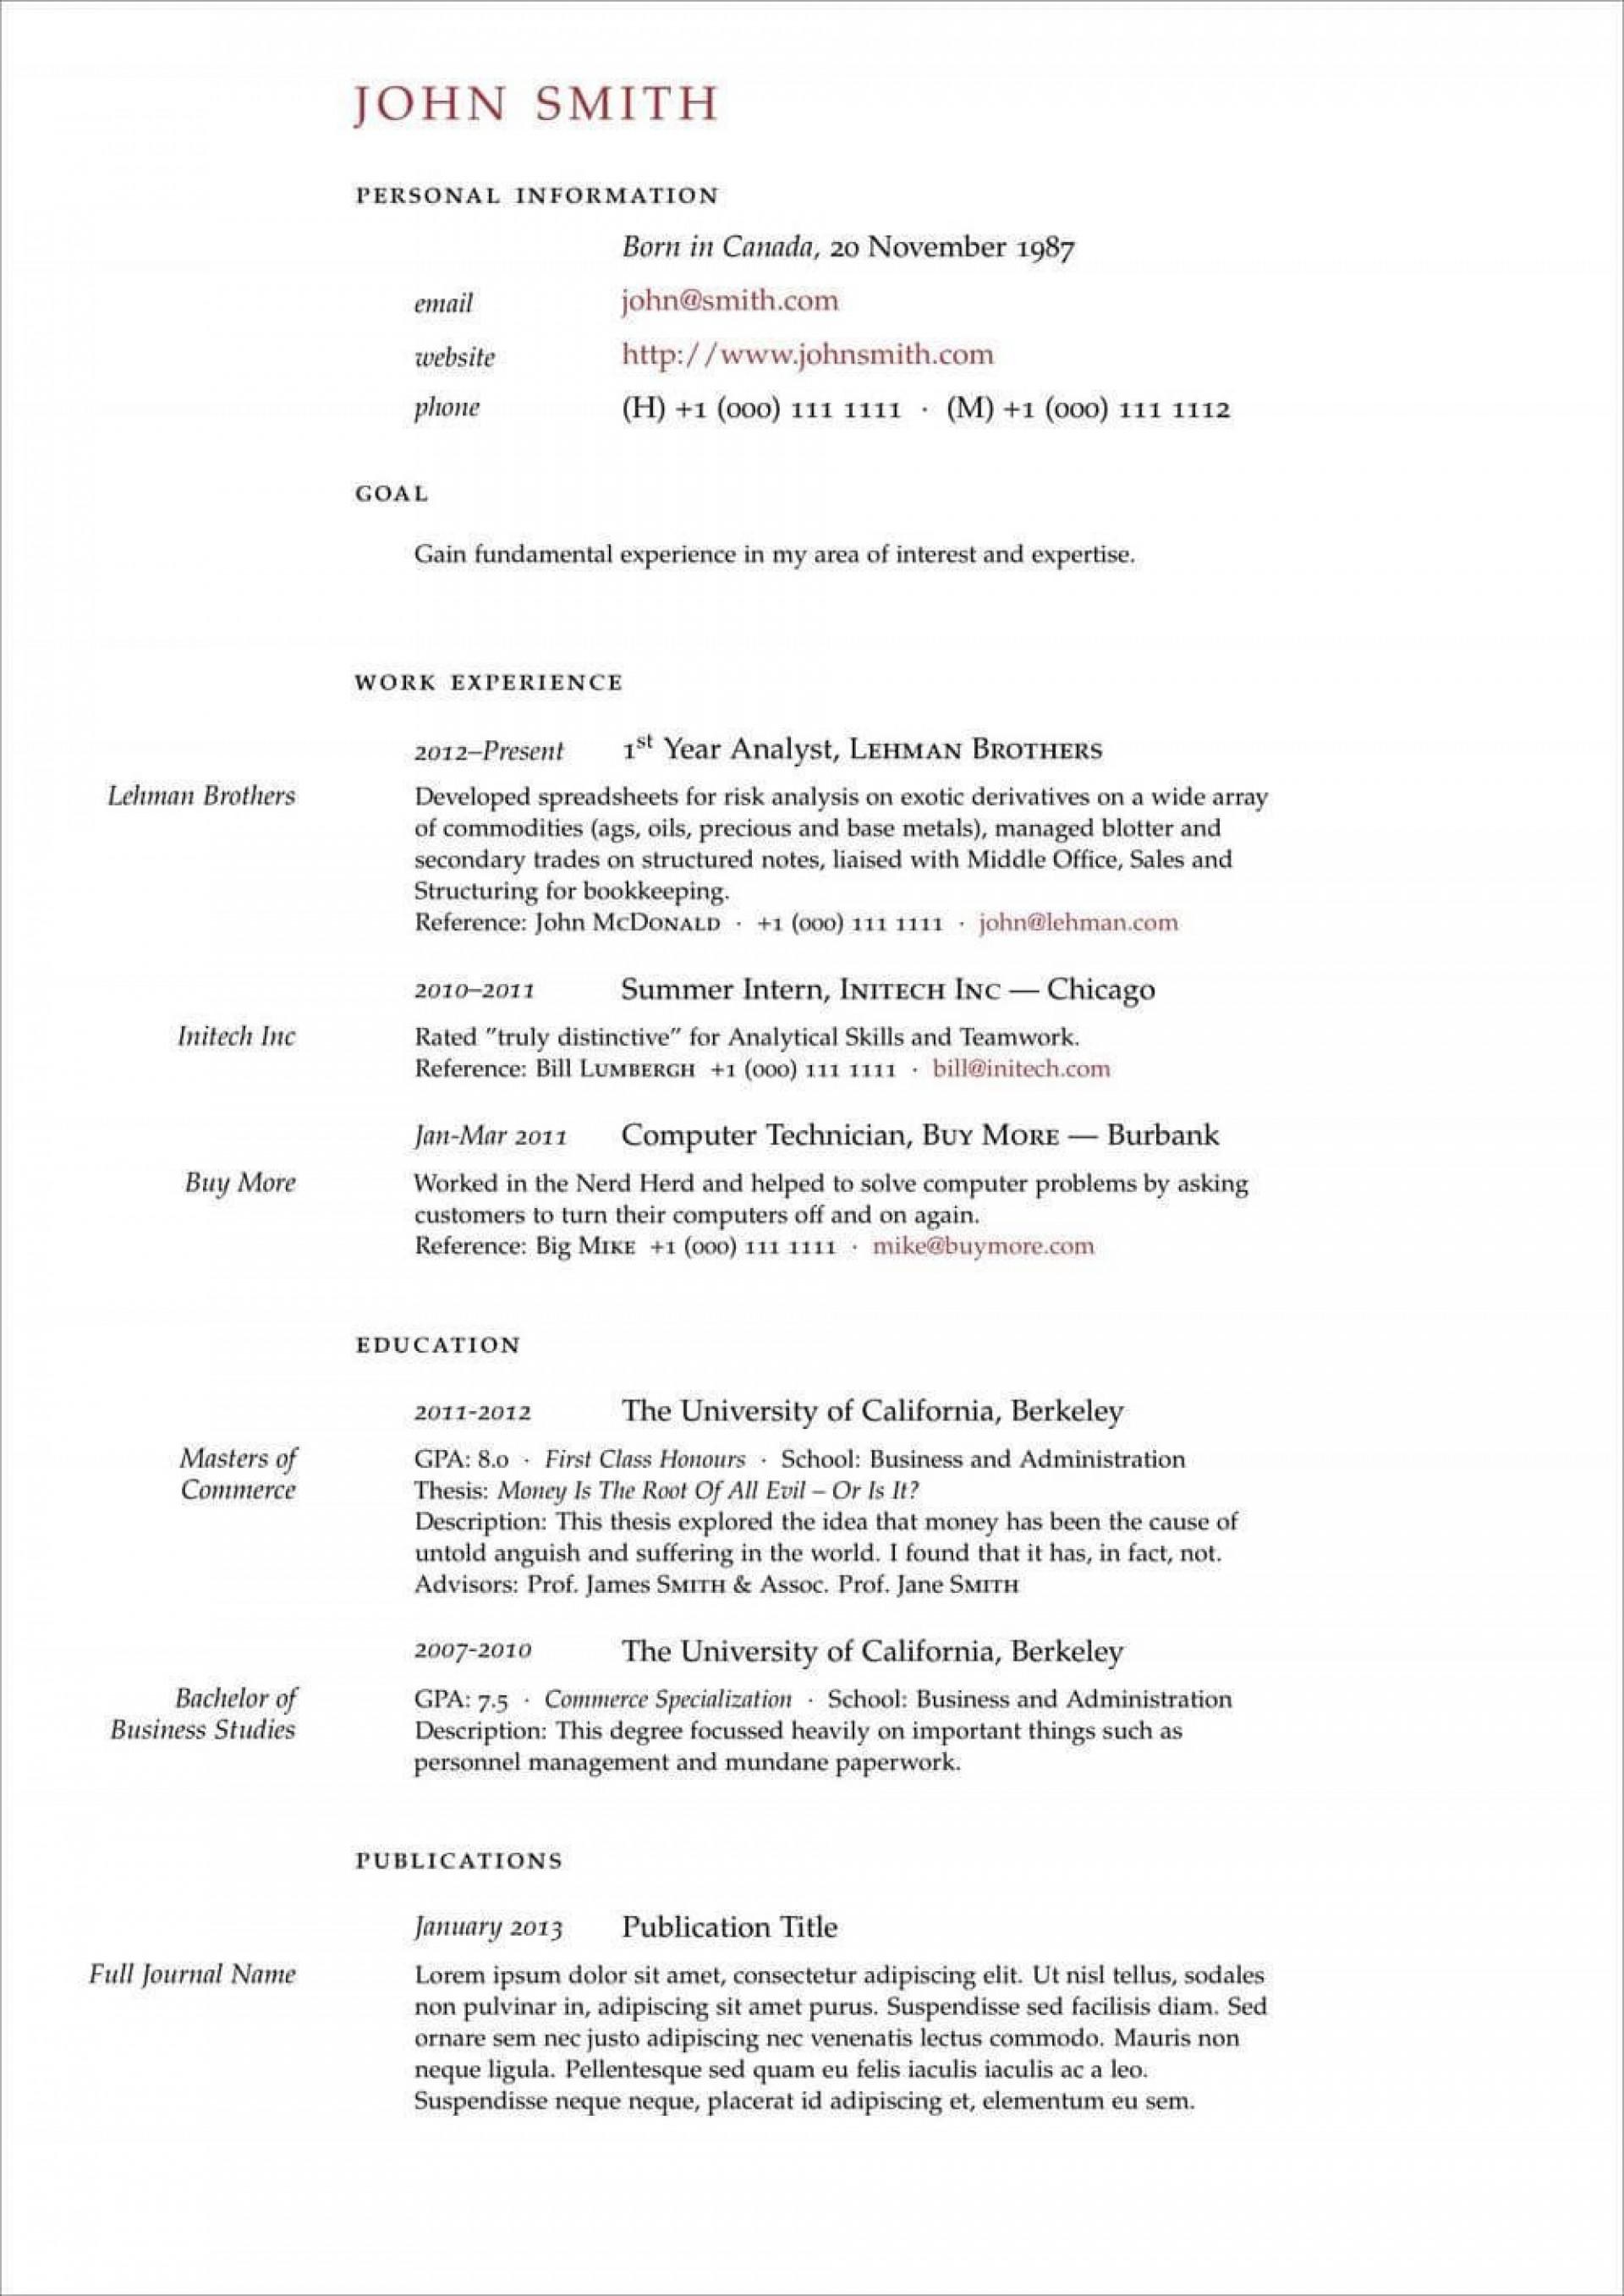 007 Fearsome Latex Resume Template Phd Example  Cv Graduate Student Economic1920